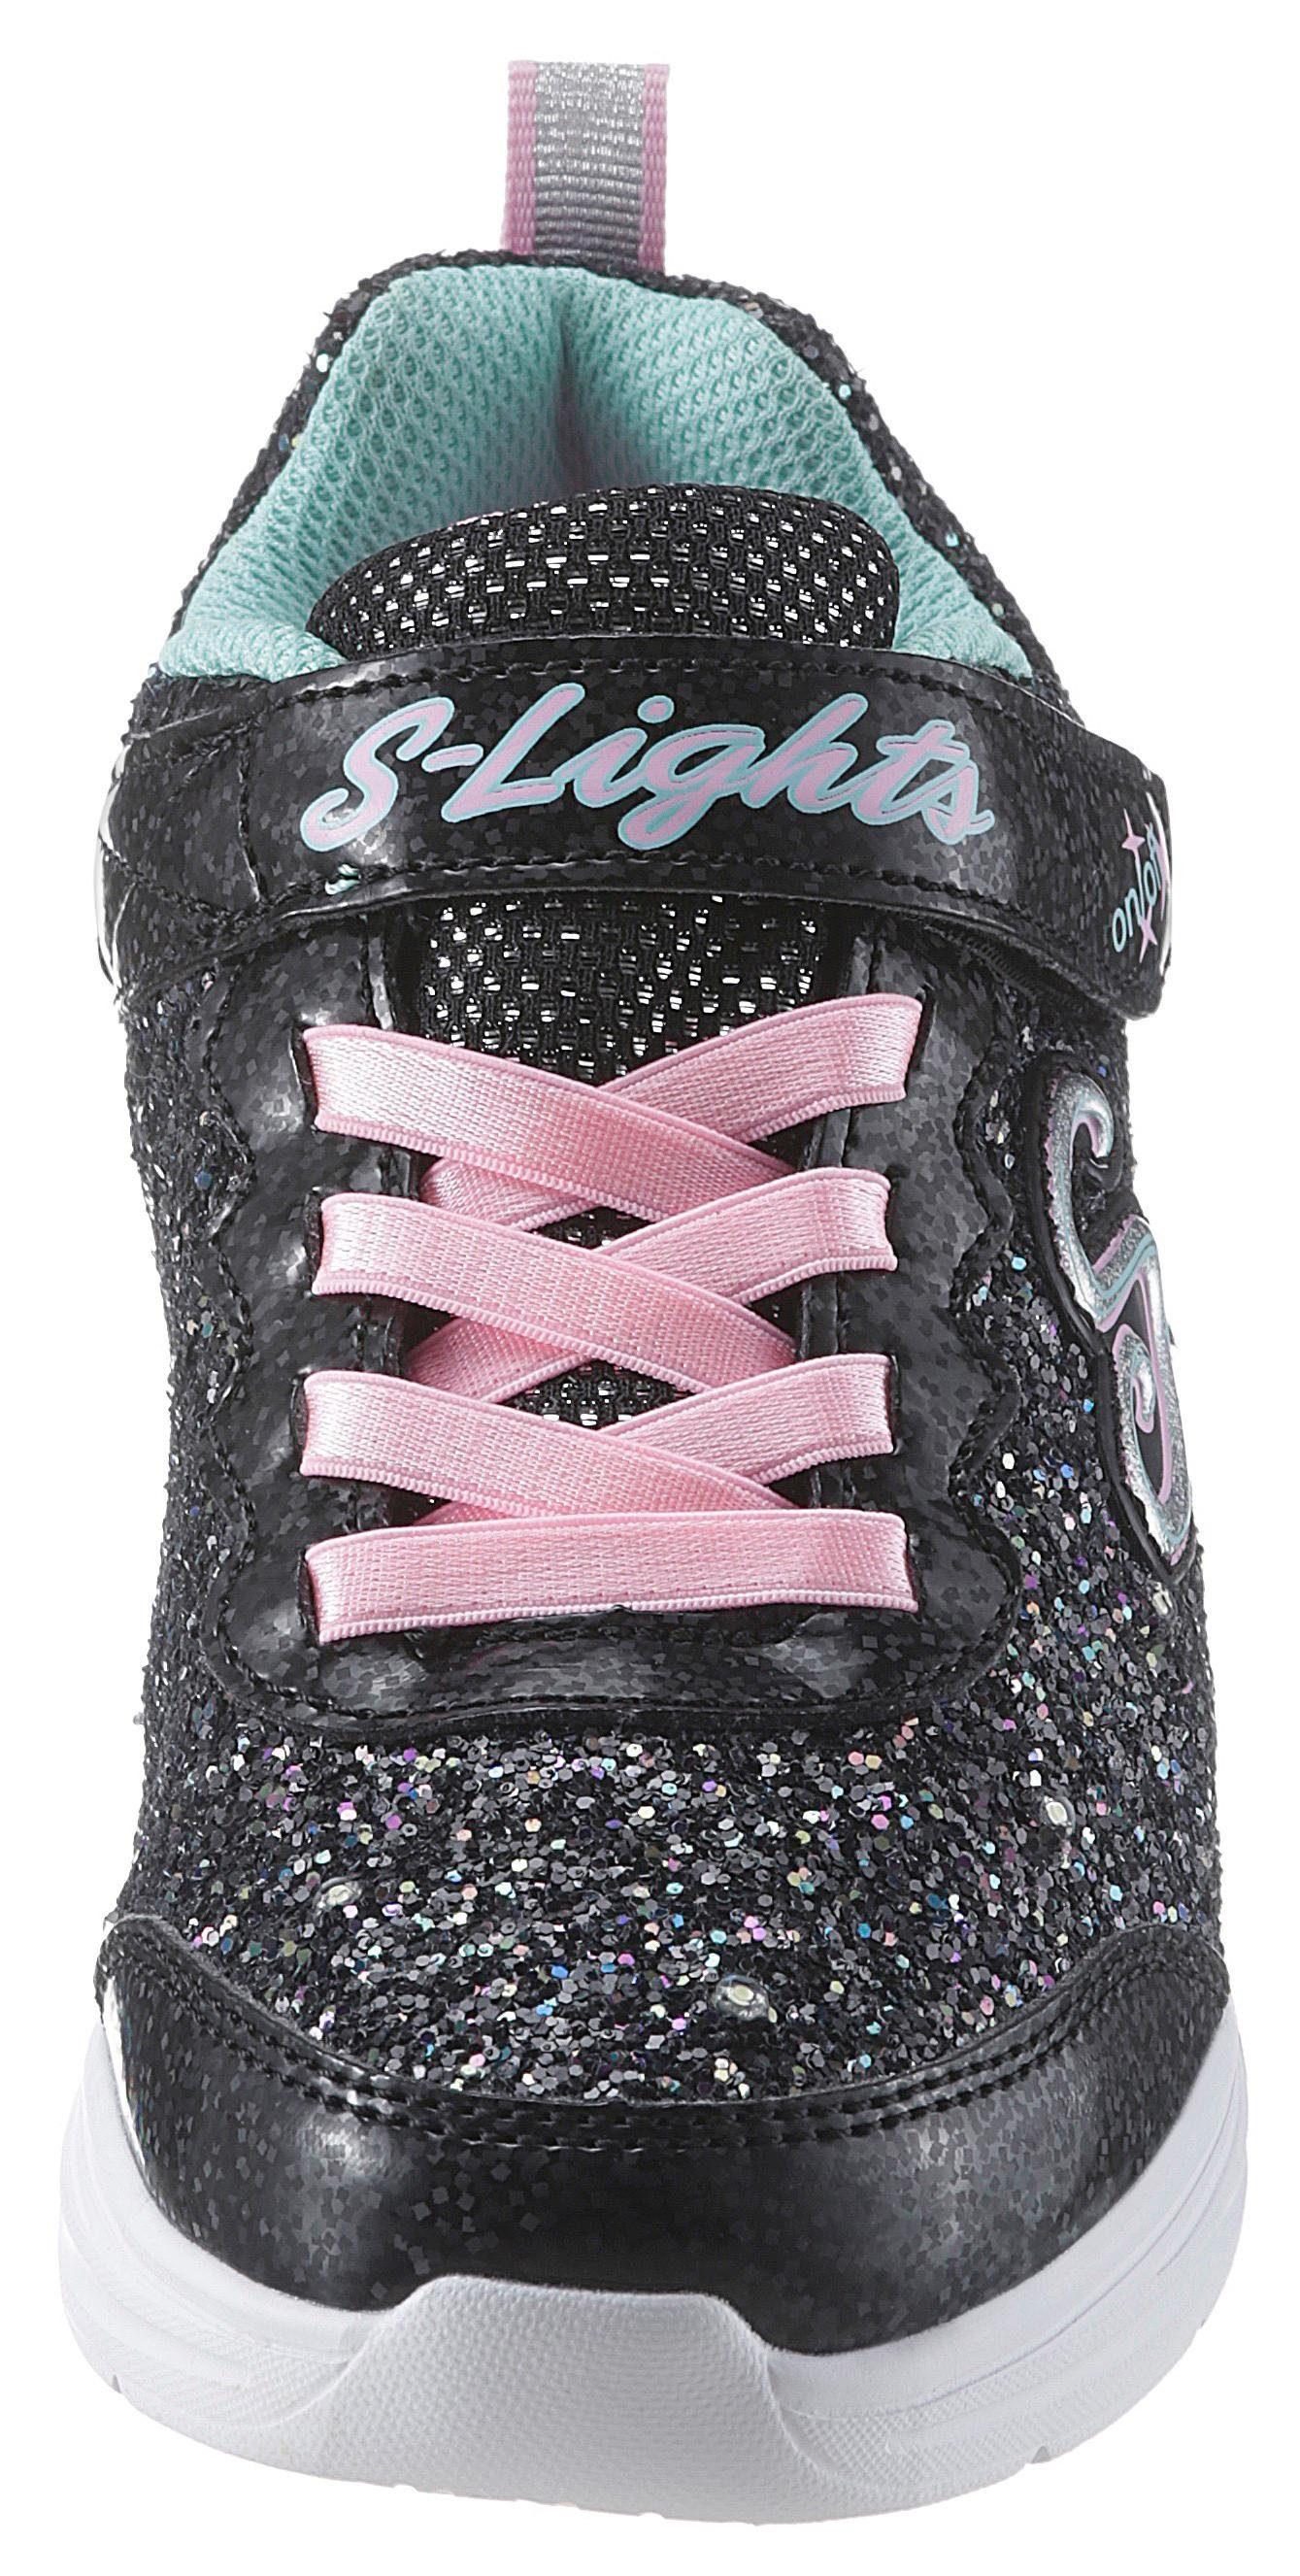 sneakers »Glimmer Kicks«